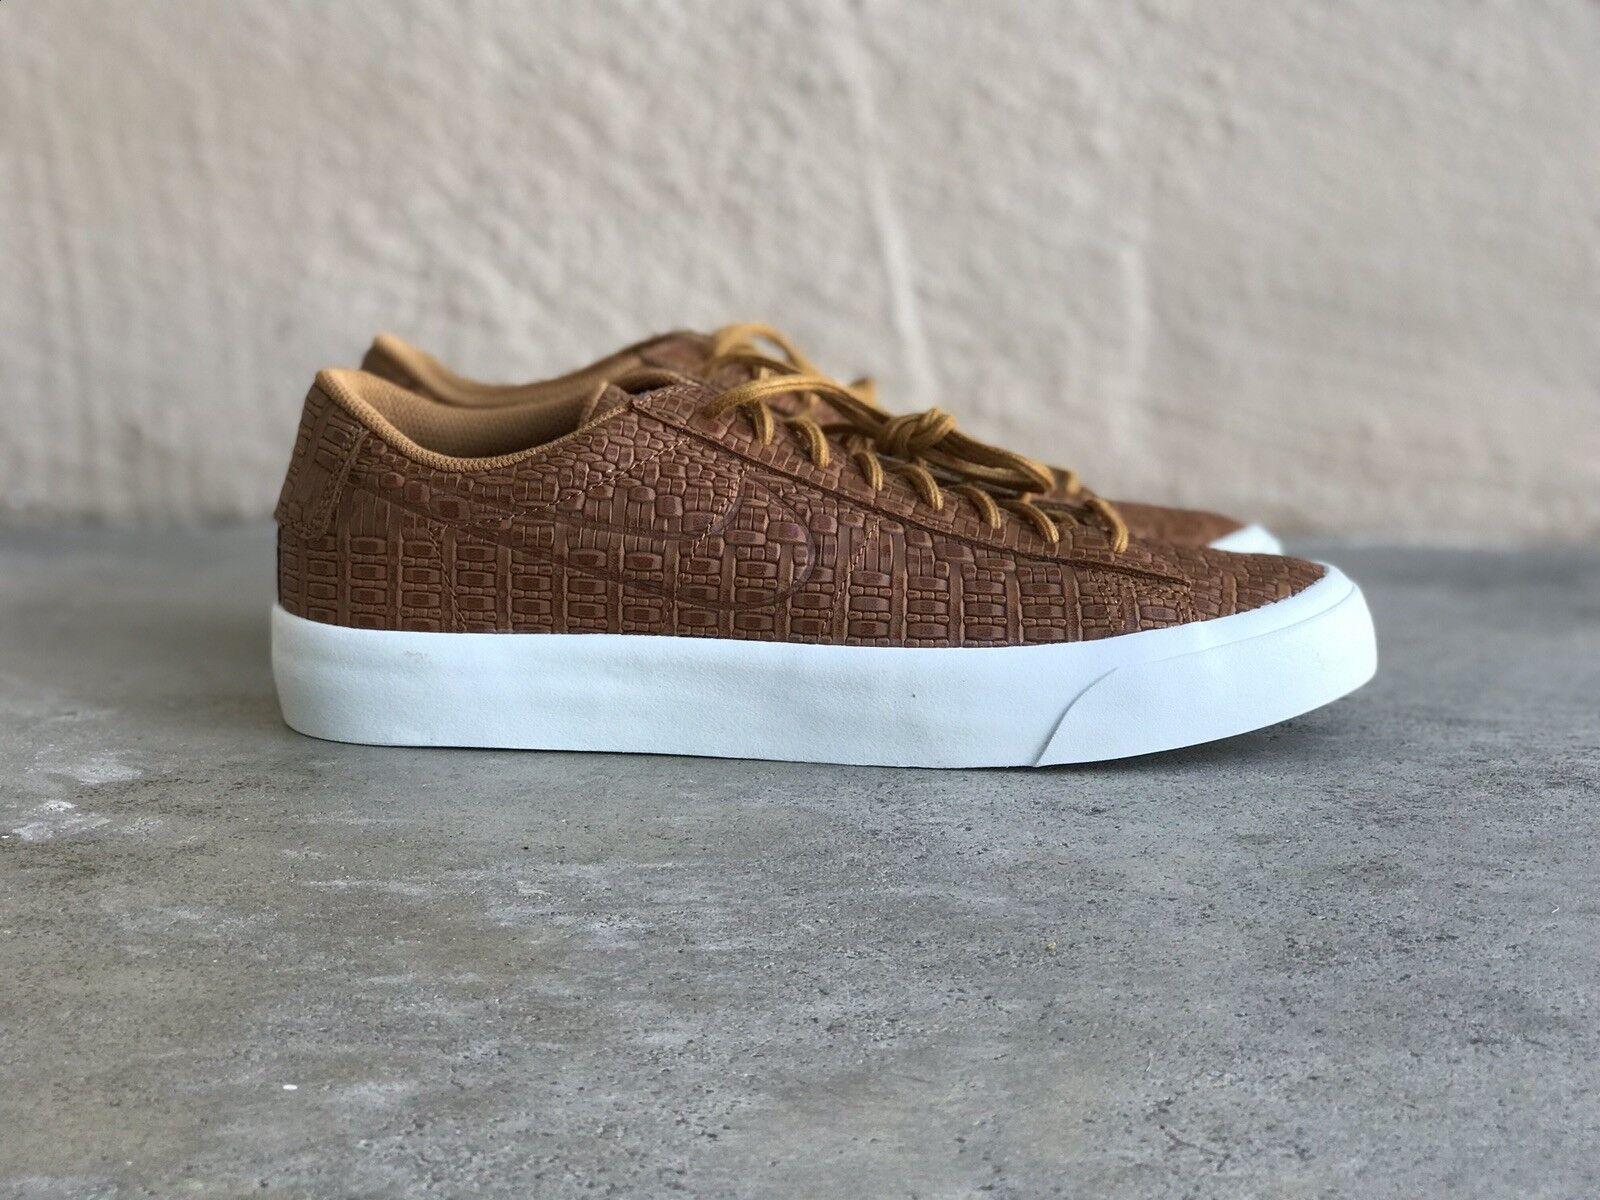 NIKE BLAZER STUDIO Low Mens sz 8.5 880872 700 Desert Ochre Croc Athletic shoes